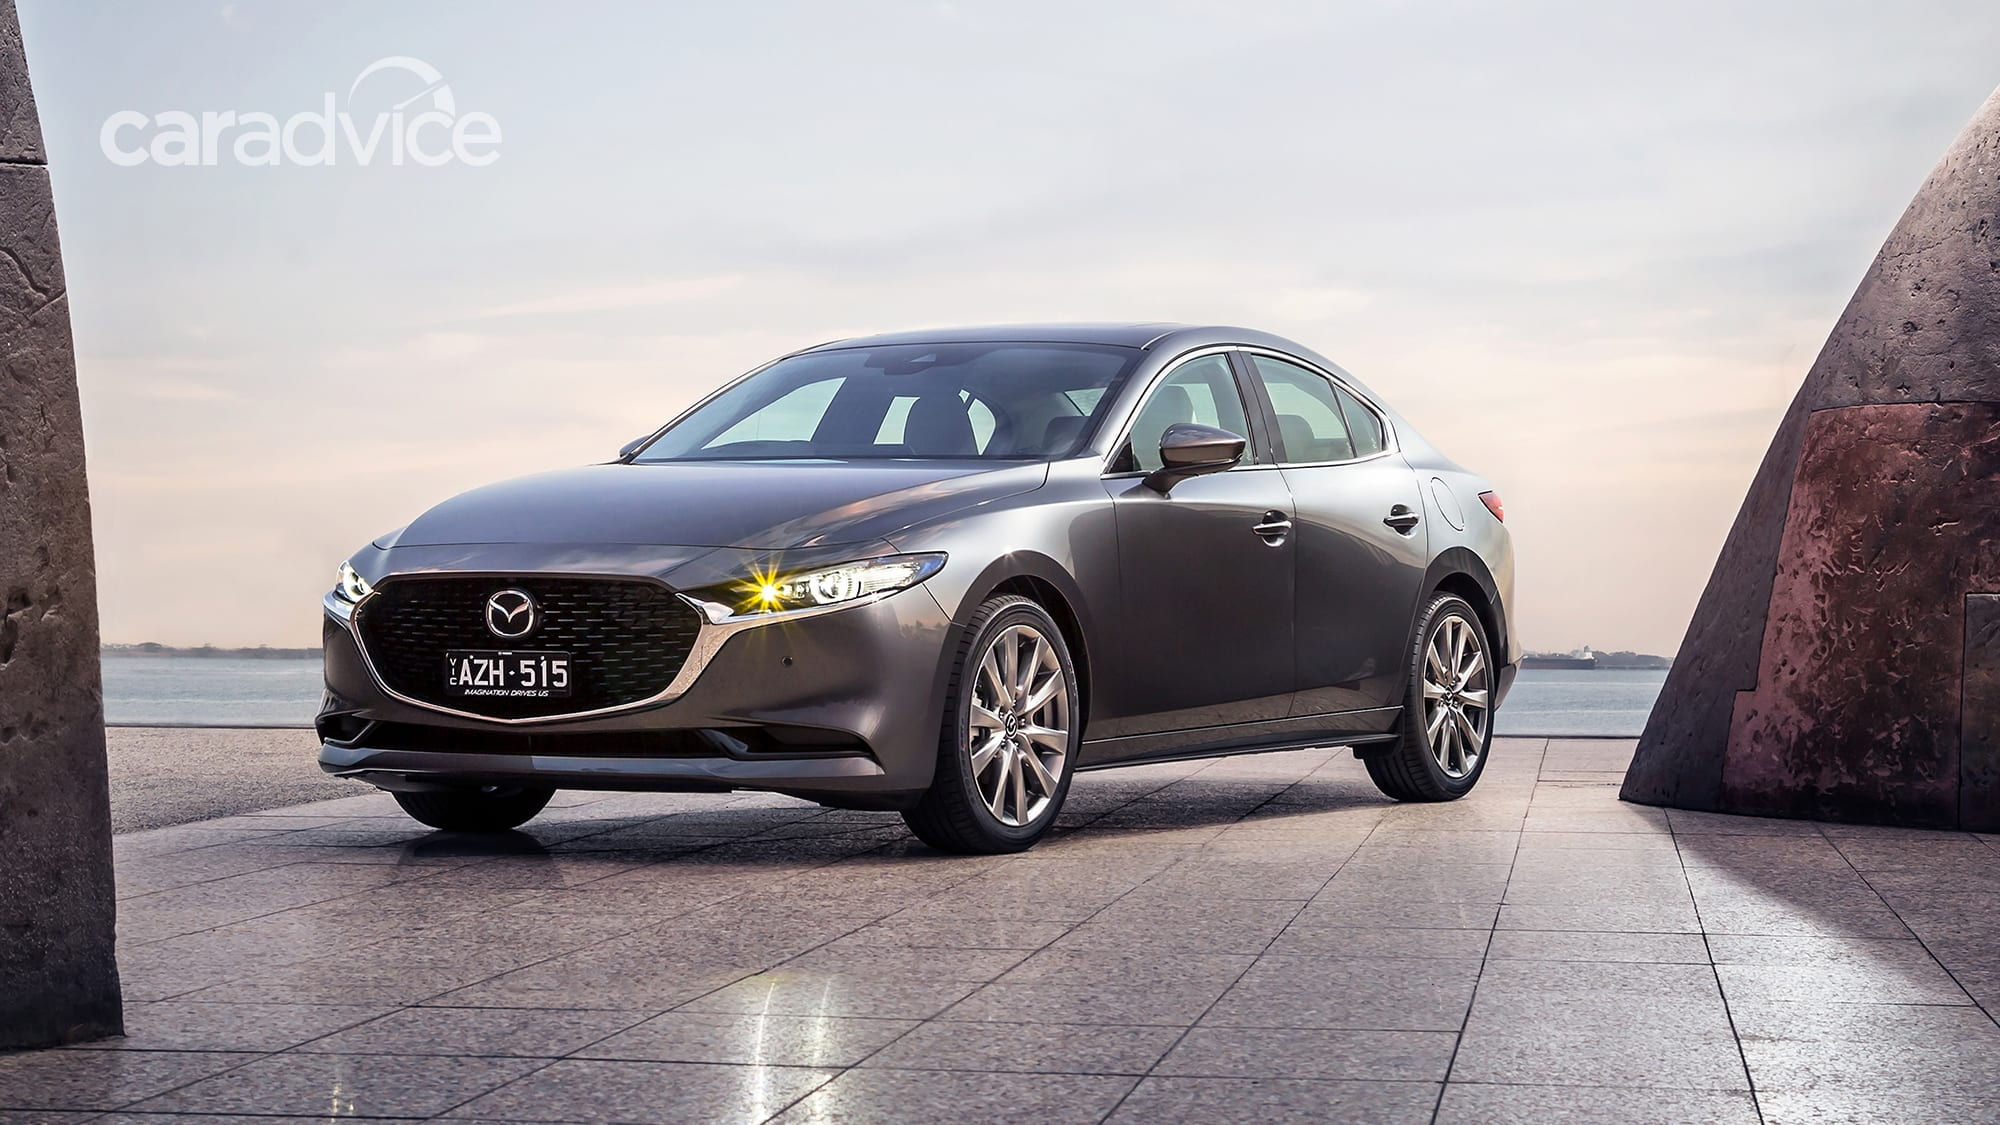 2019 Mazda 3 sedan pricing and specs | CarAdvice